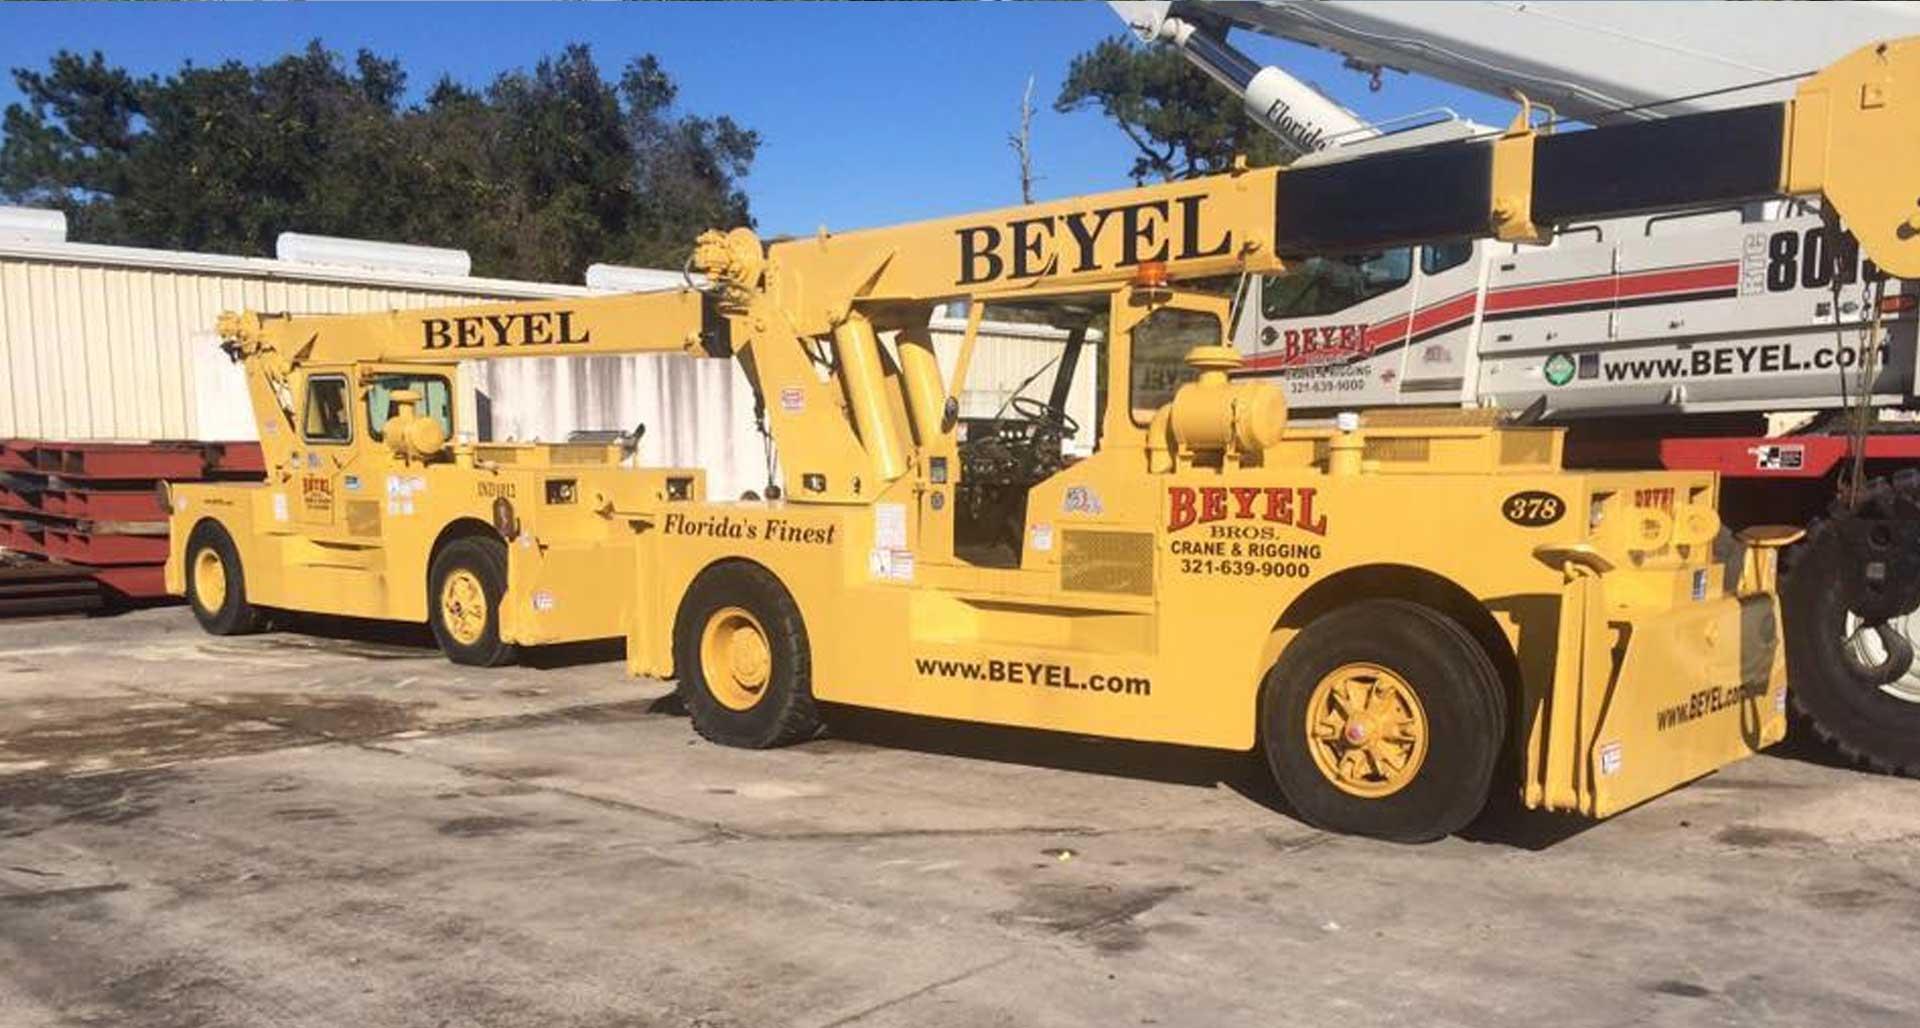 Beyel Brothers - Jacksonville, FL - www.beyel.com